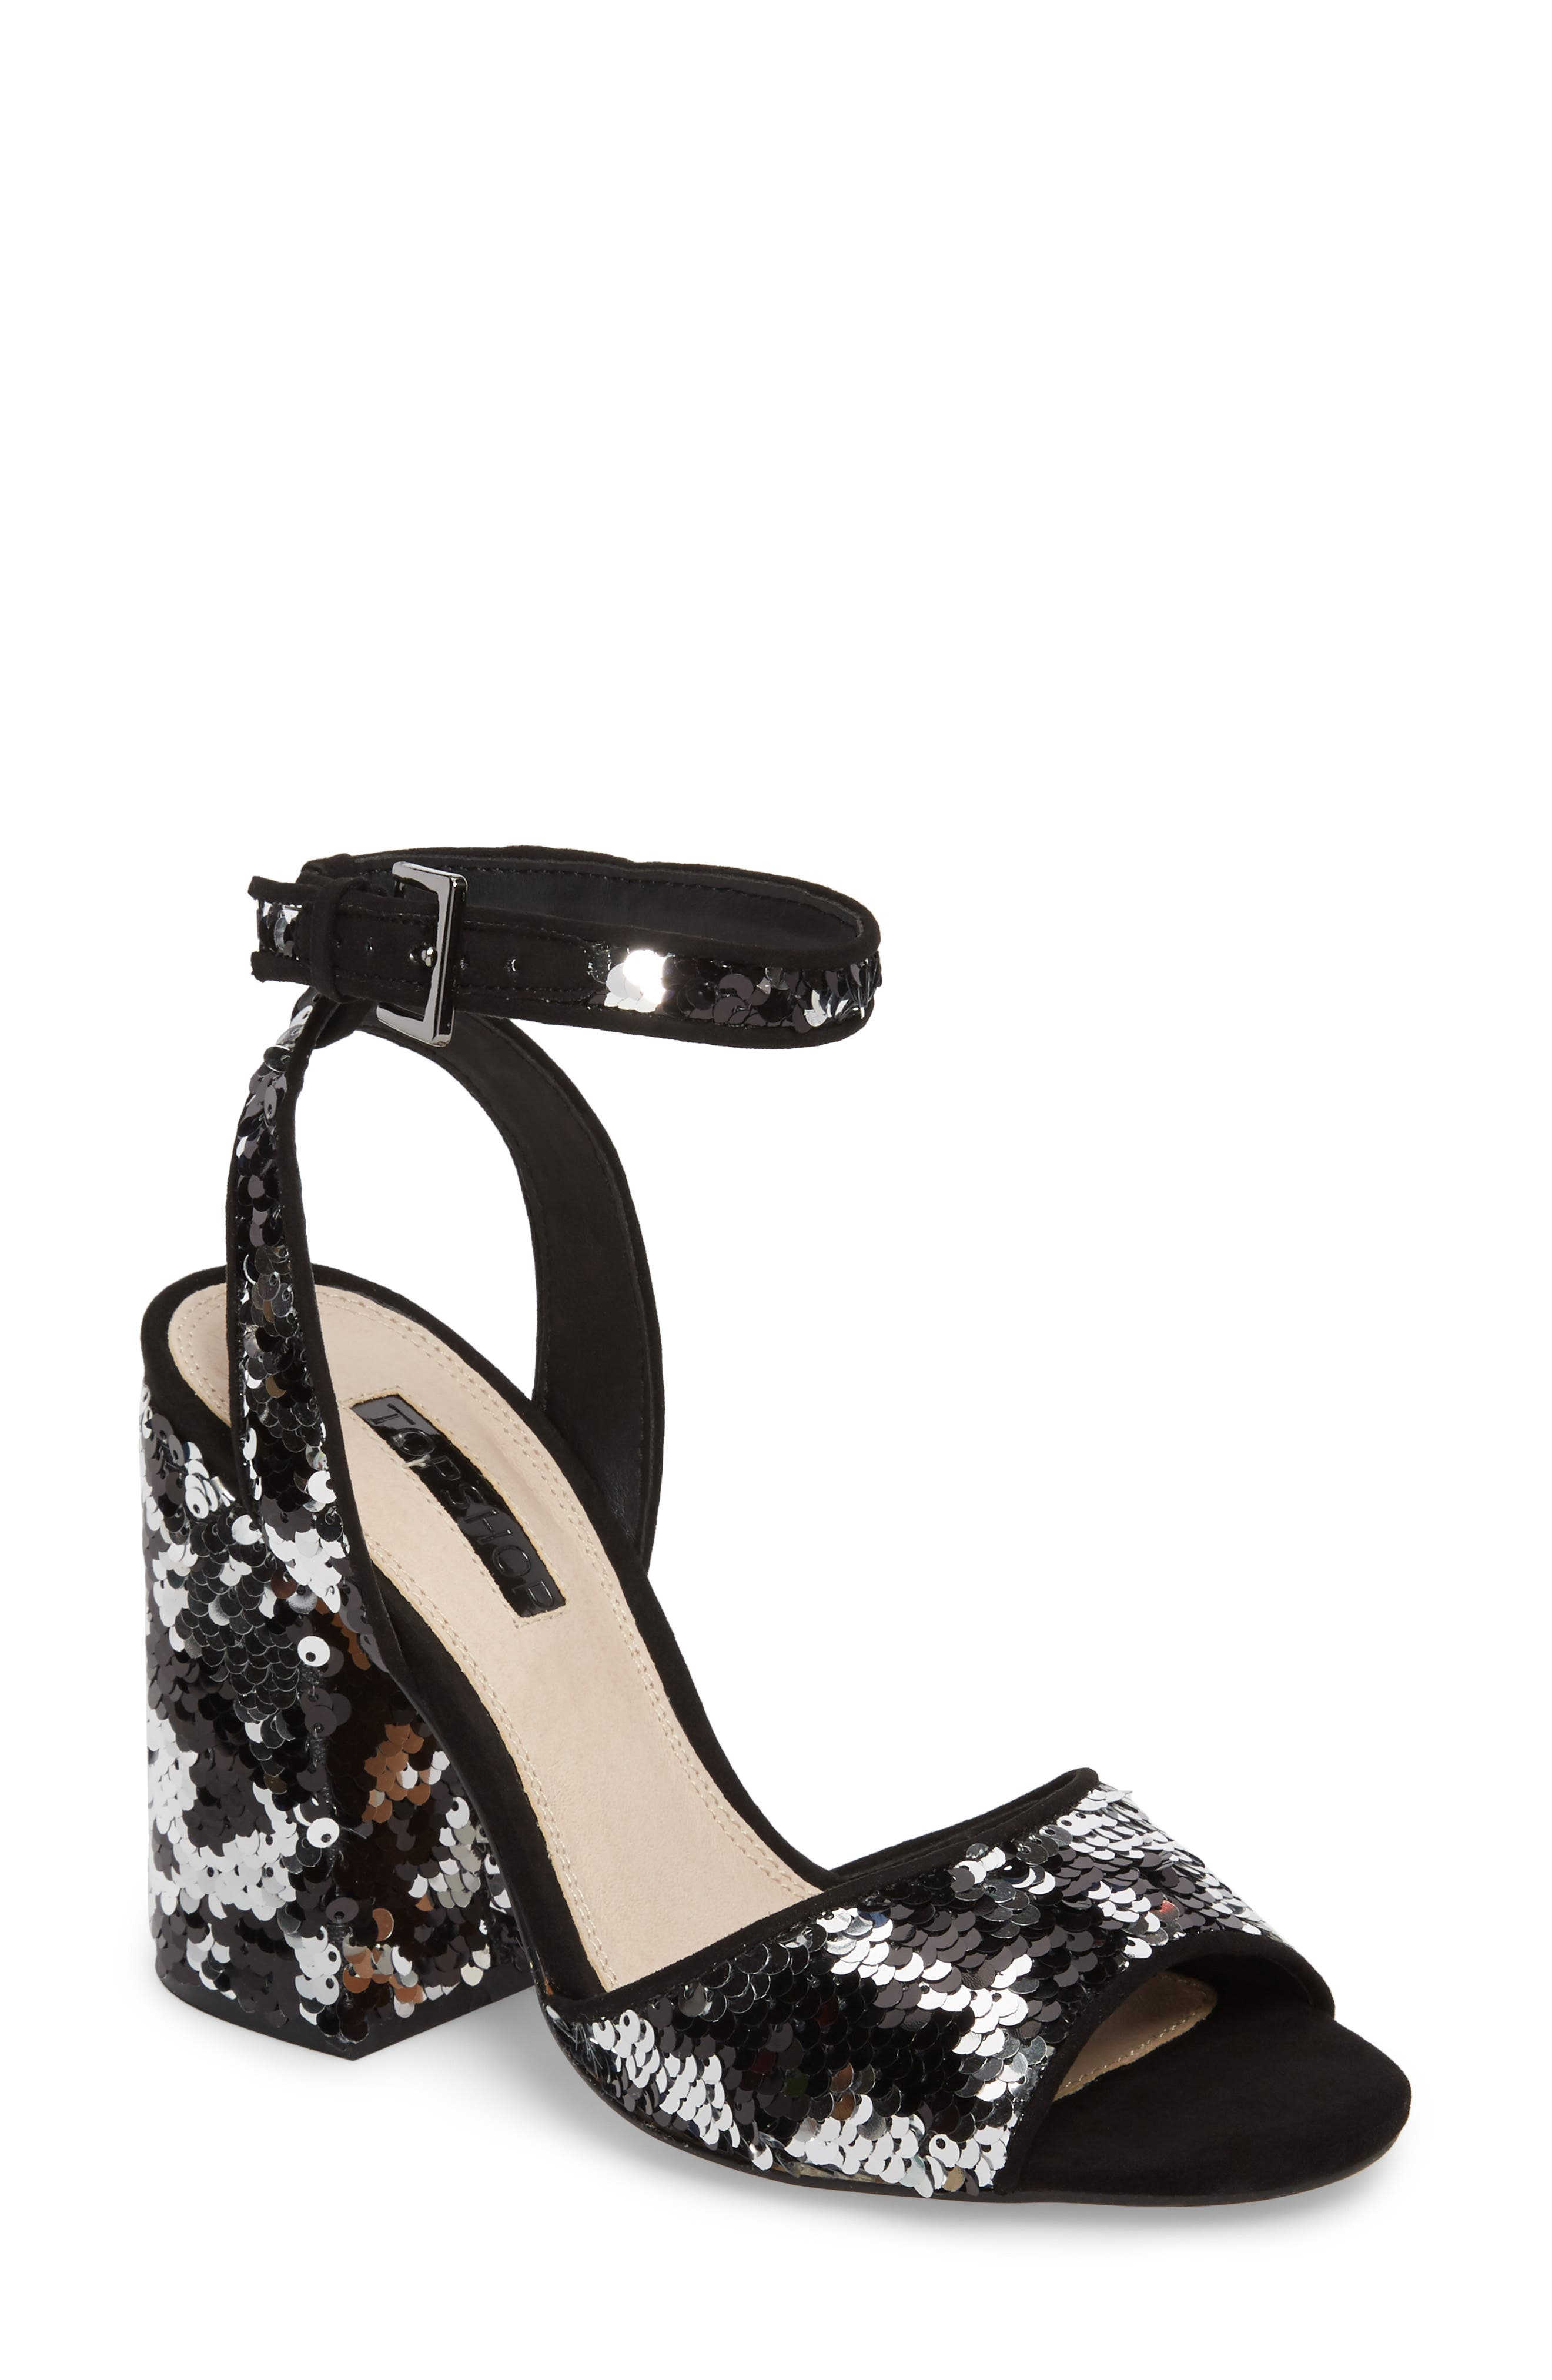 Reaction Sequin Block Heel Sandal,                             Main thumbnail 1, color,                             Black Multi